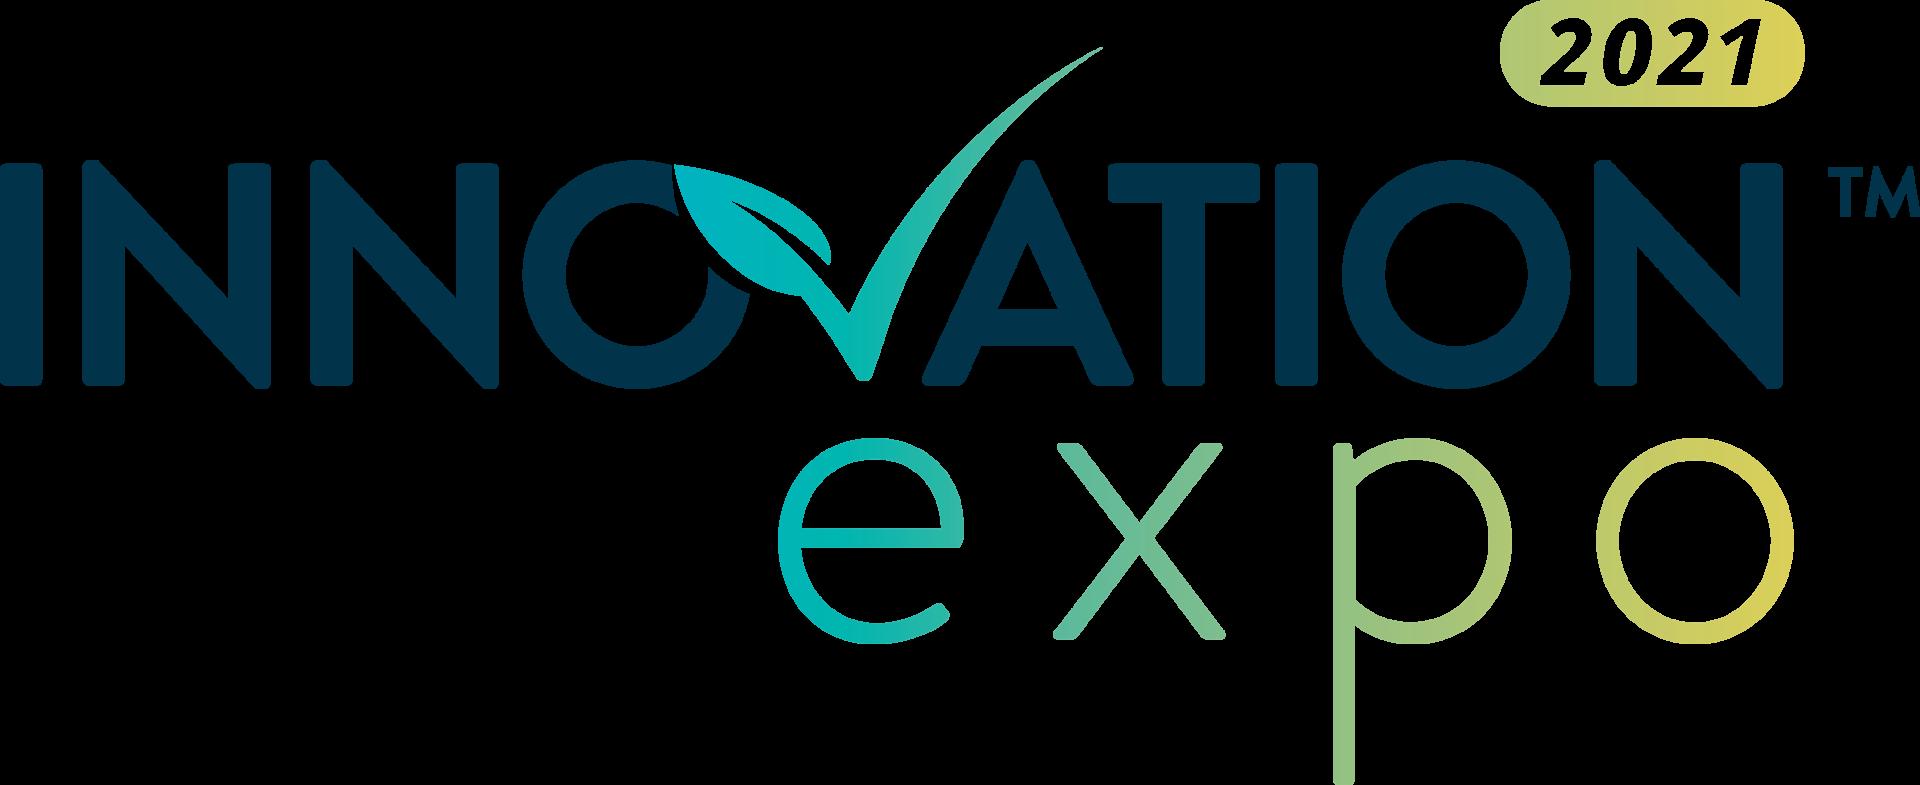 Ontario Innovation Expo - Logo 2021